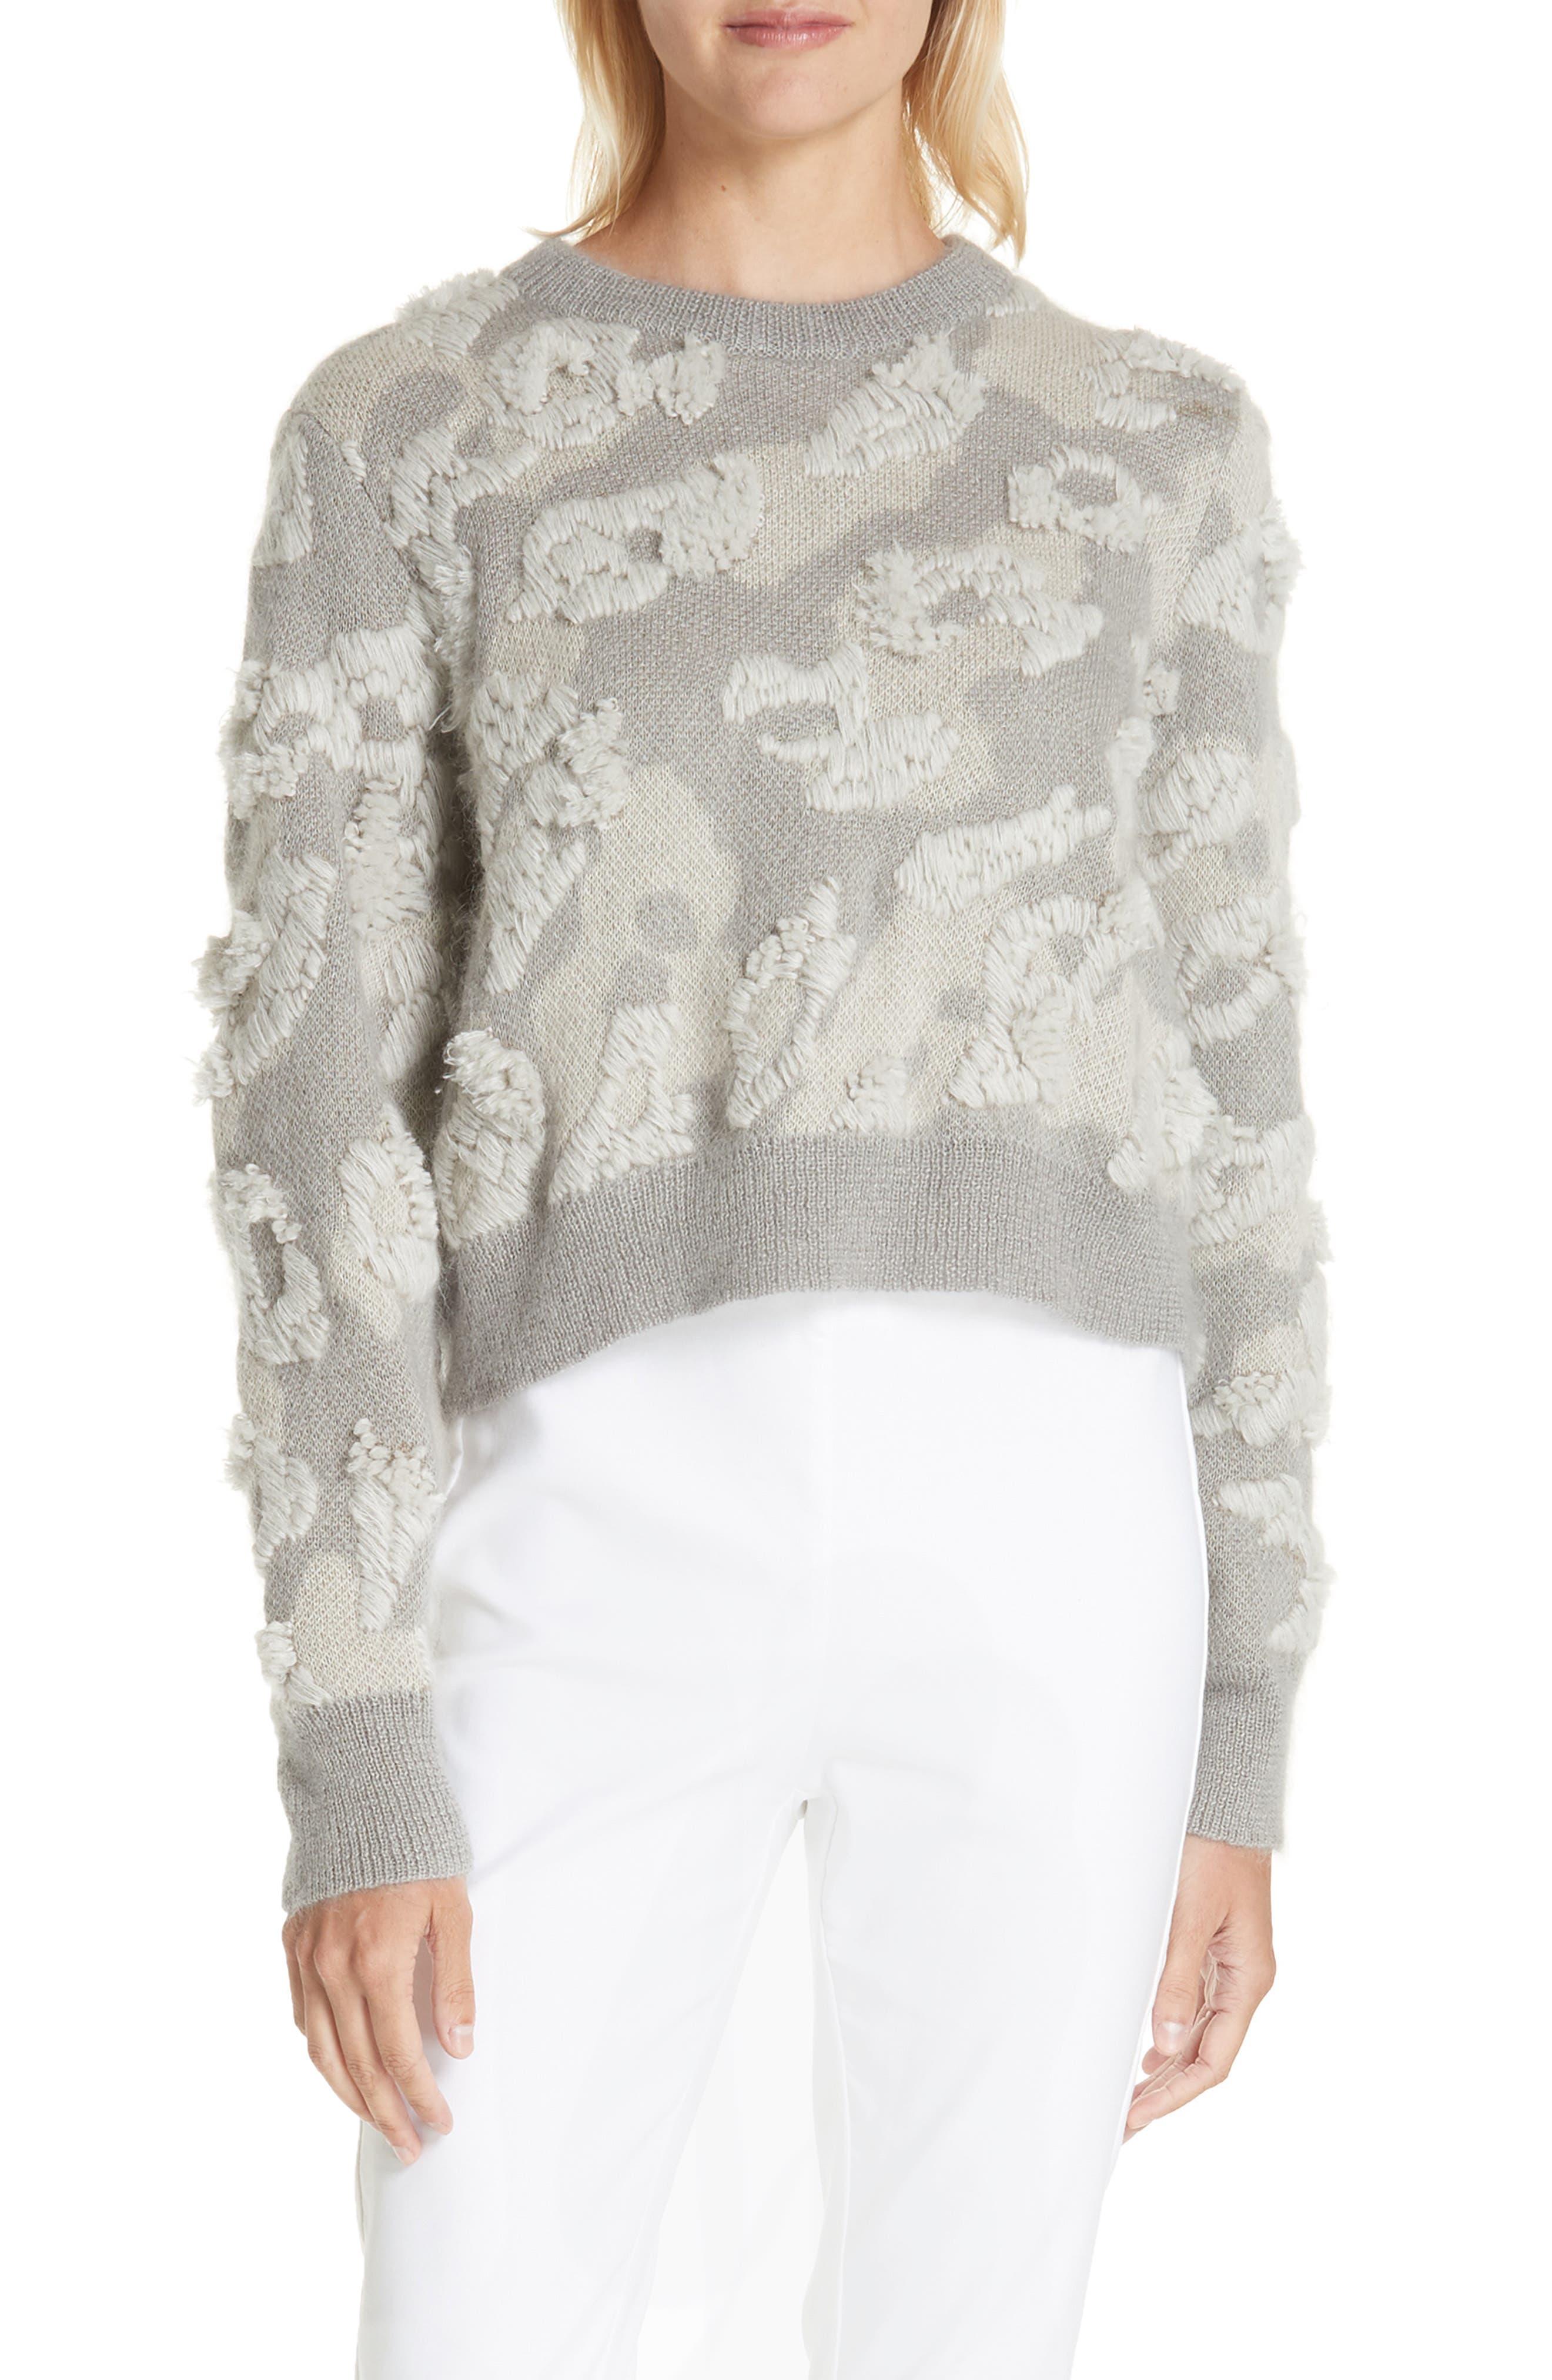 RAG & BONE Embroidered Leopard Spot Sweater, Main, color, 900